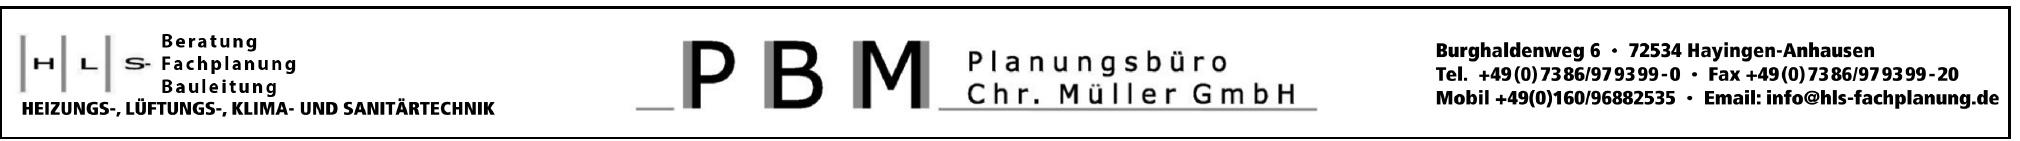 PBM Planungsbüro Chr. Müller GmbH